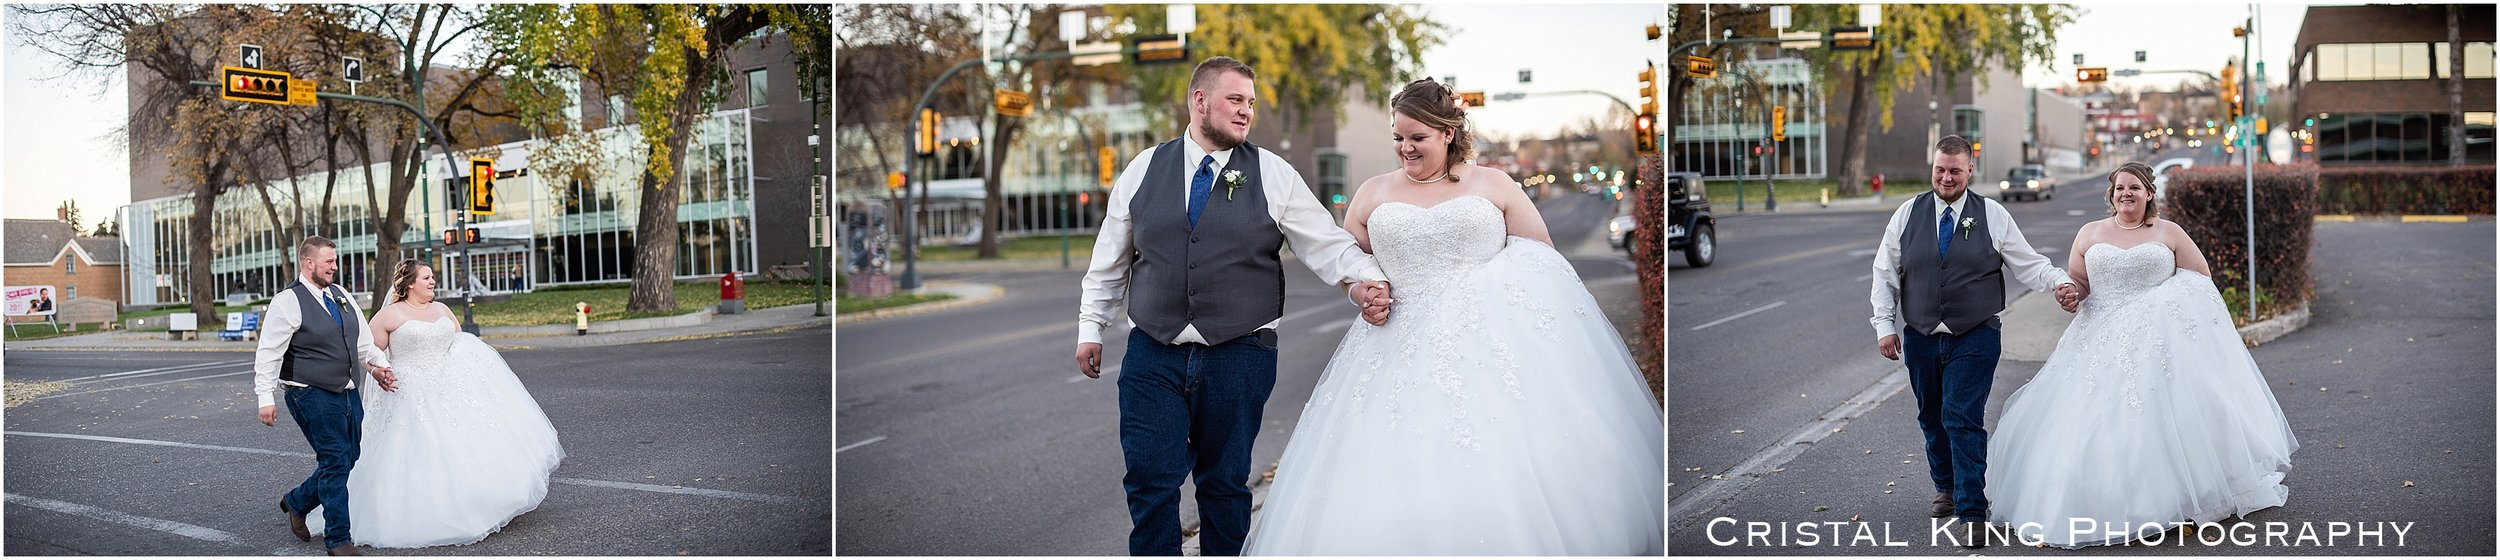 Tracy-Kyles-Wedding-177.jpg